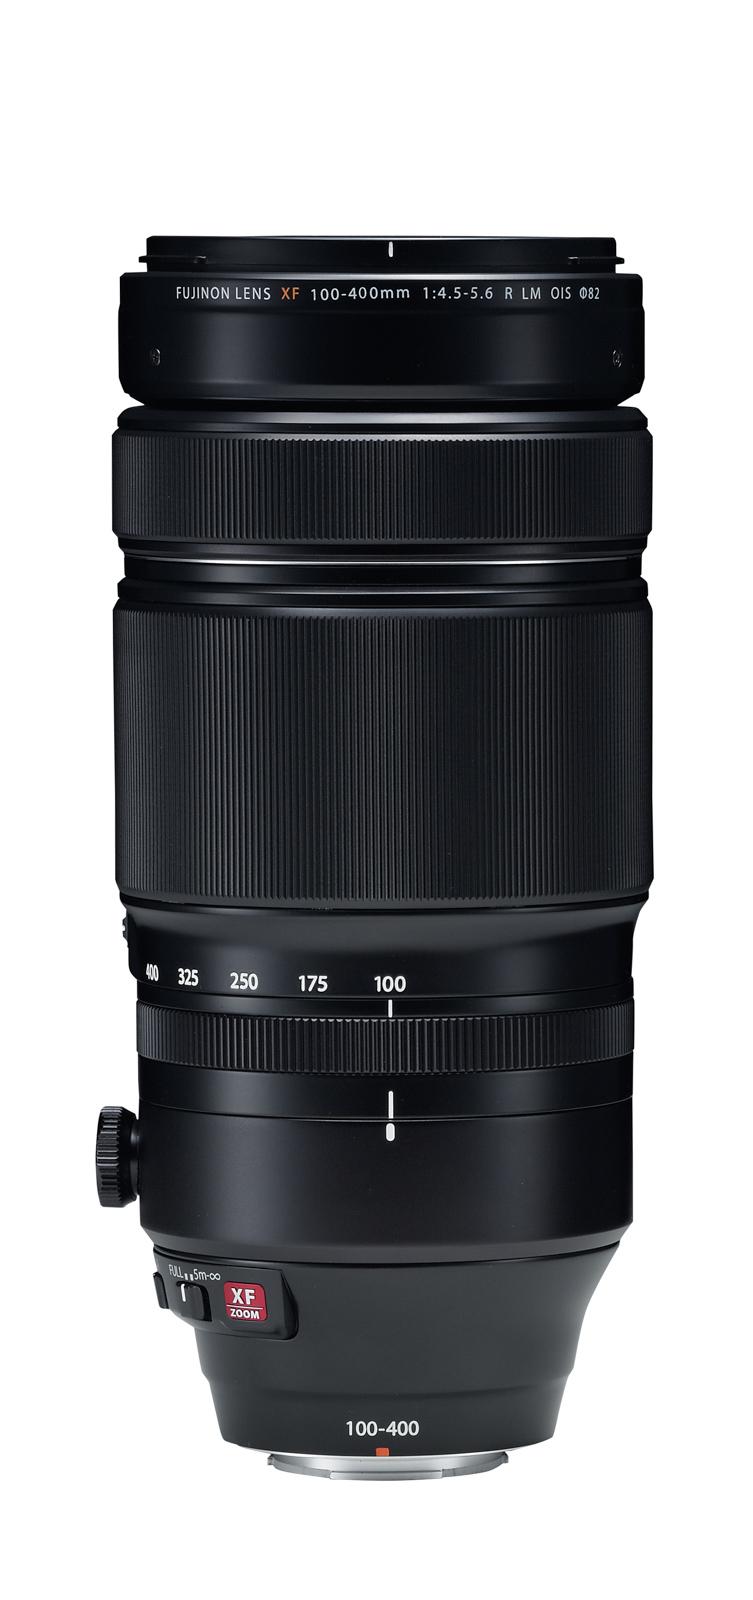 Fujifilm Fujinon XF 100-400mm F4.5-5.6 R WR OIS